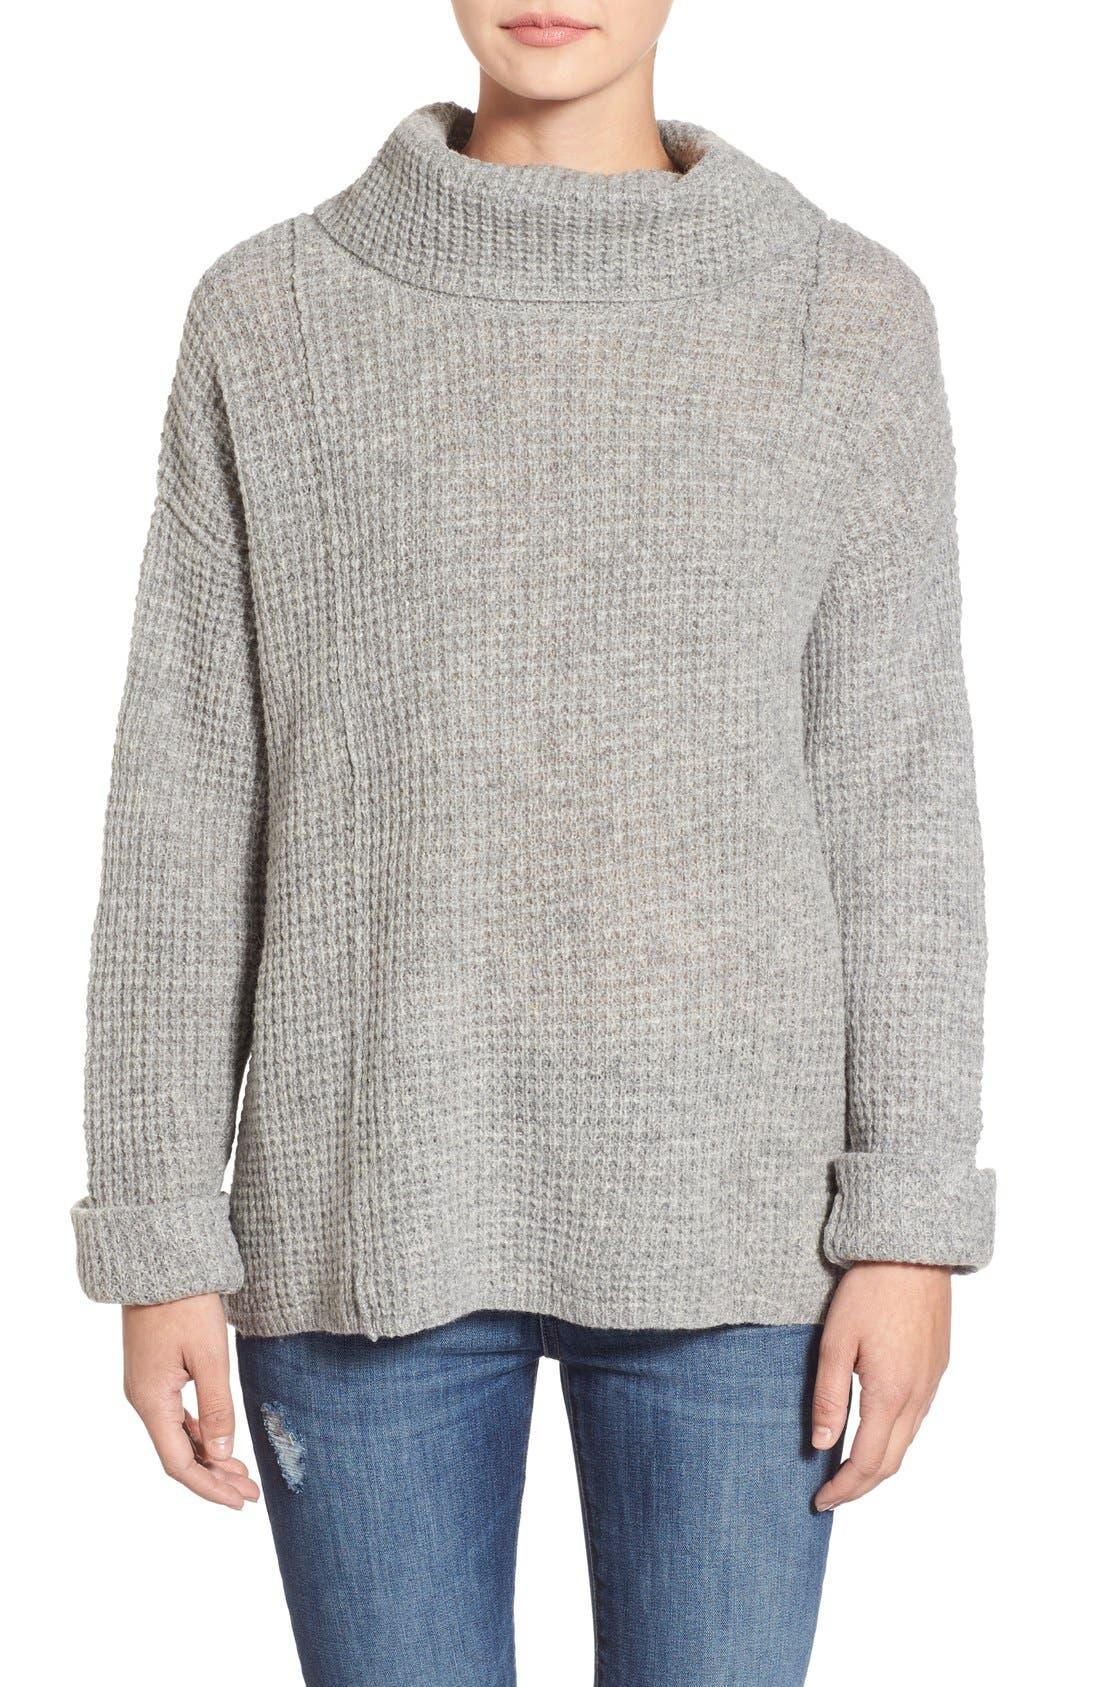 Main Image - Free People 'Sidewinder' Wool Pullover